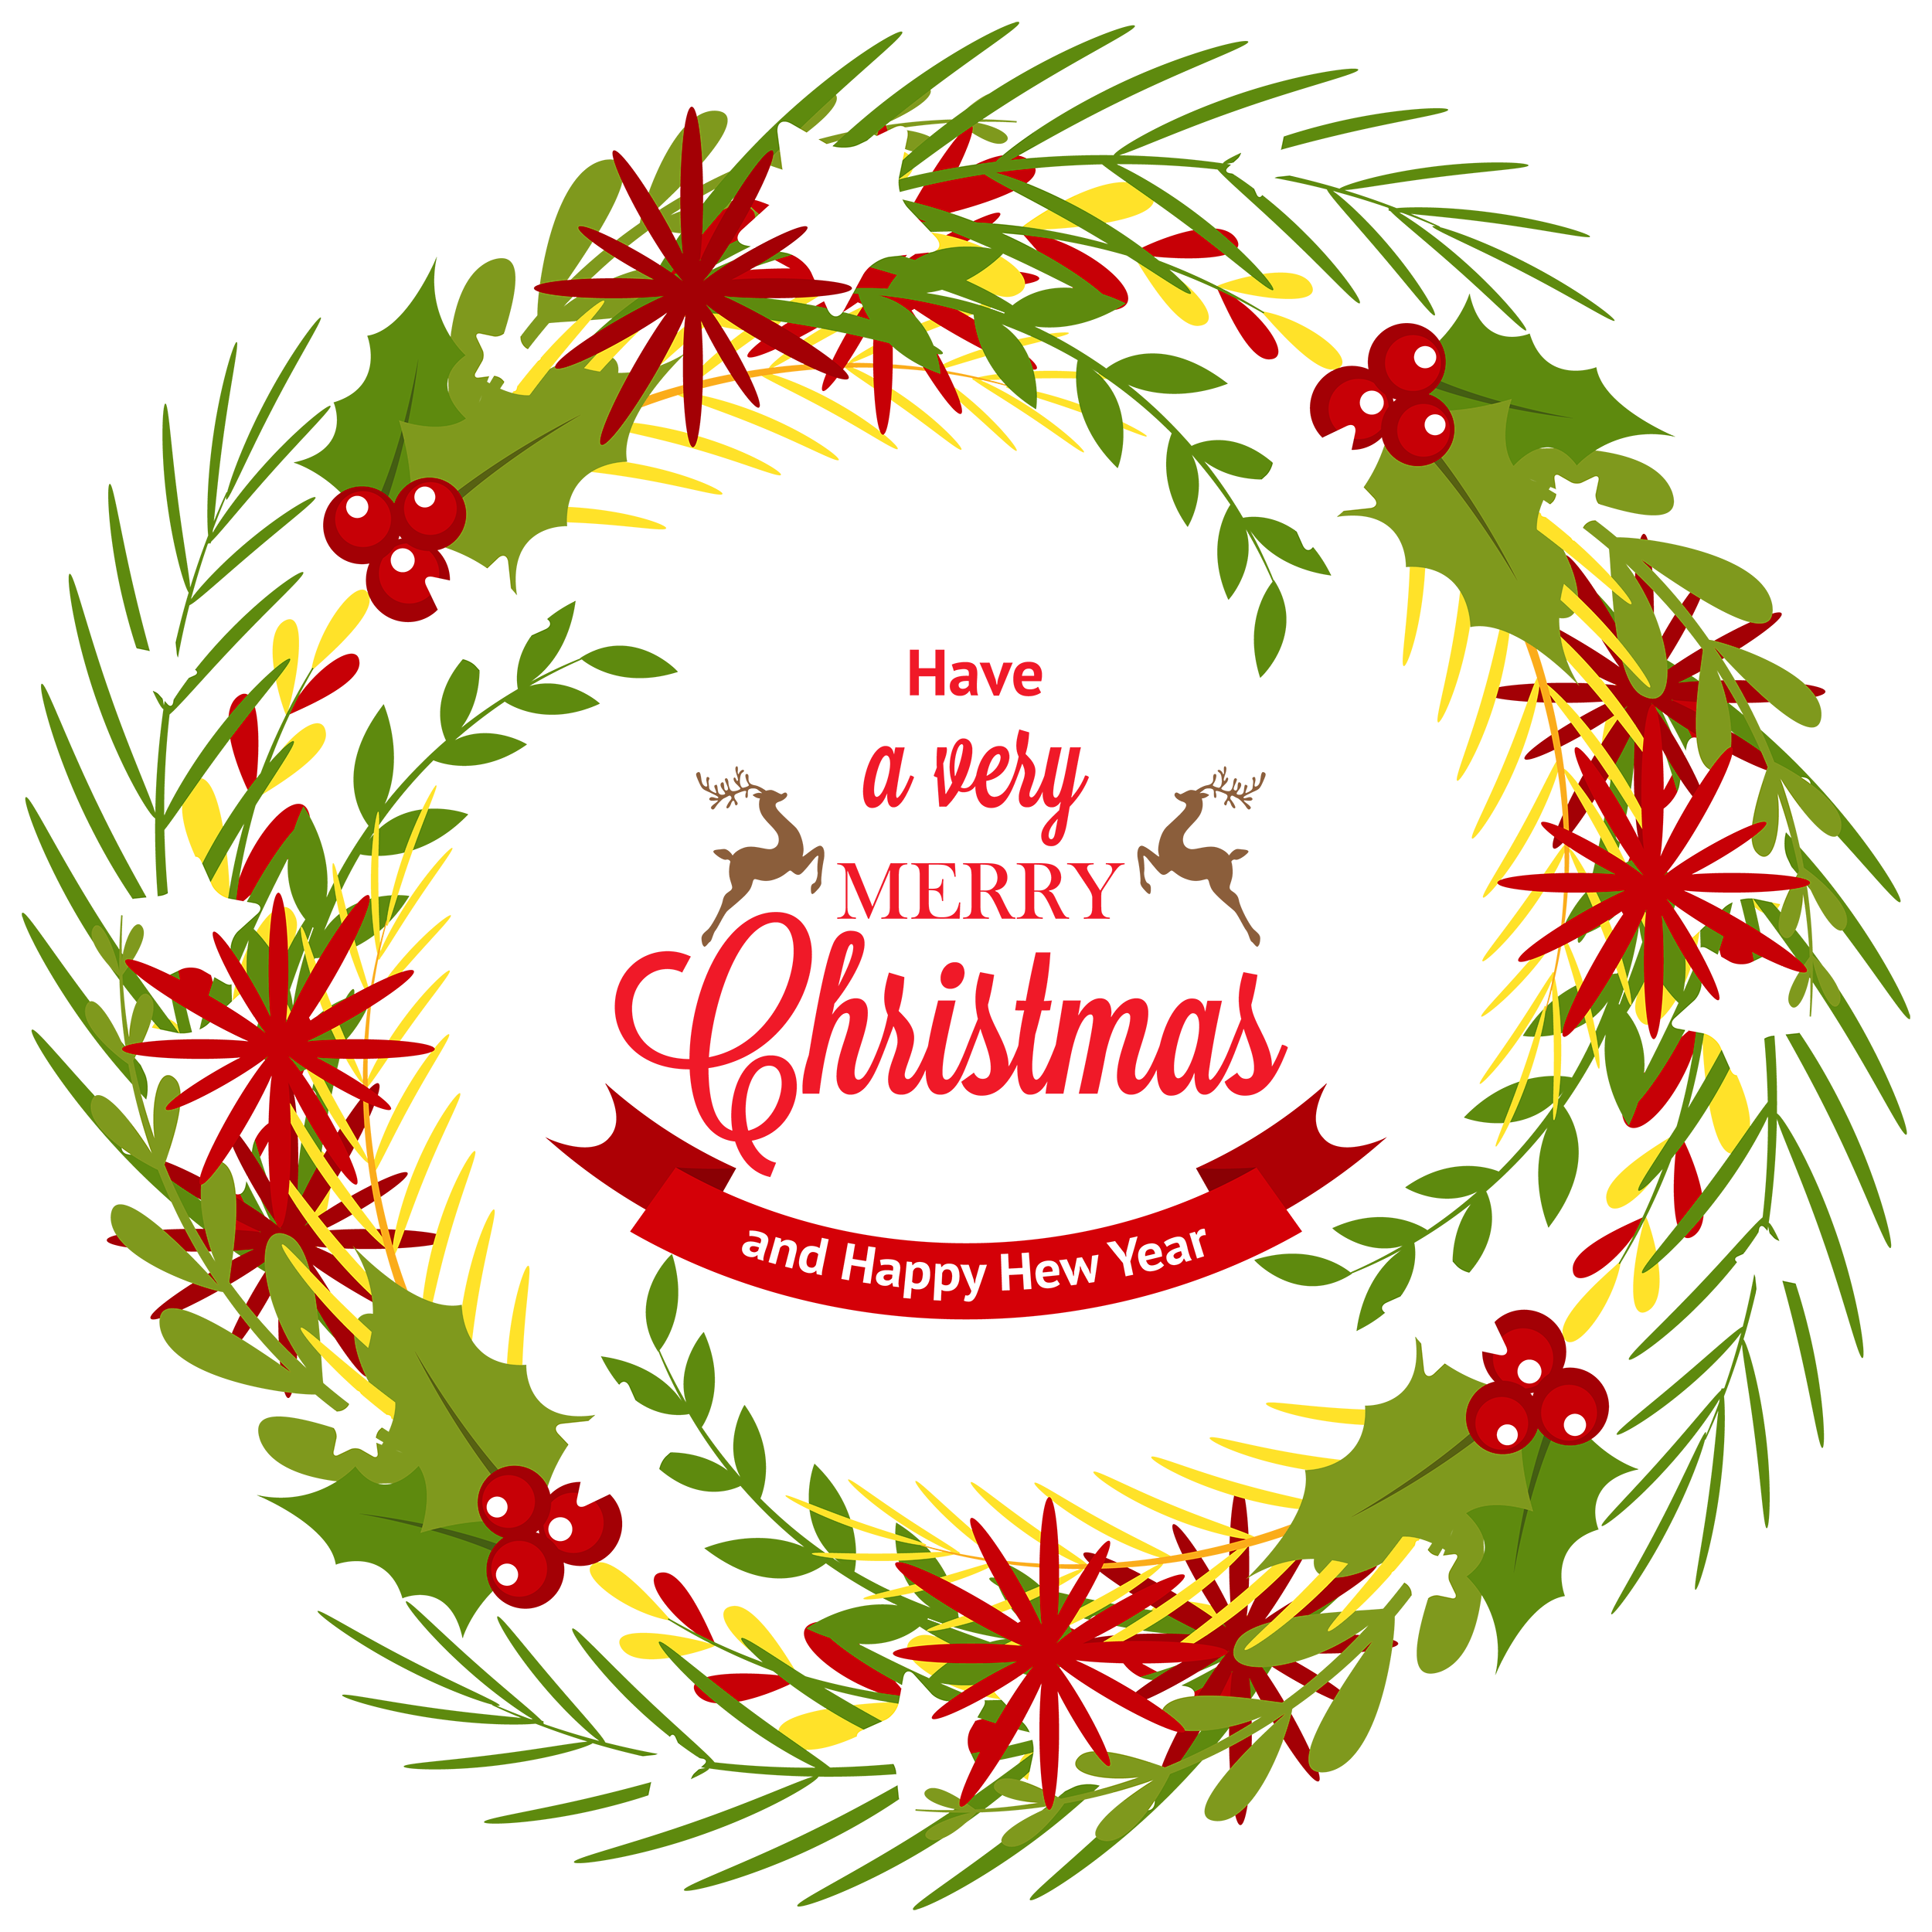 Christmas mistletoe clipart jpg royalty free stock Christmas Wreath with Mistletoe PNG Clipart - Best WEB Clipart jpg royalty free stock